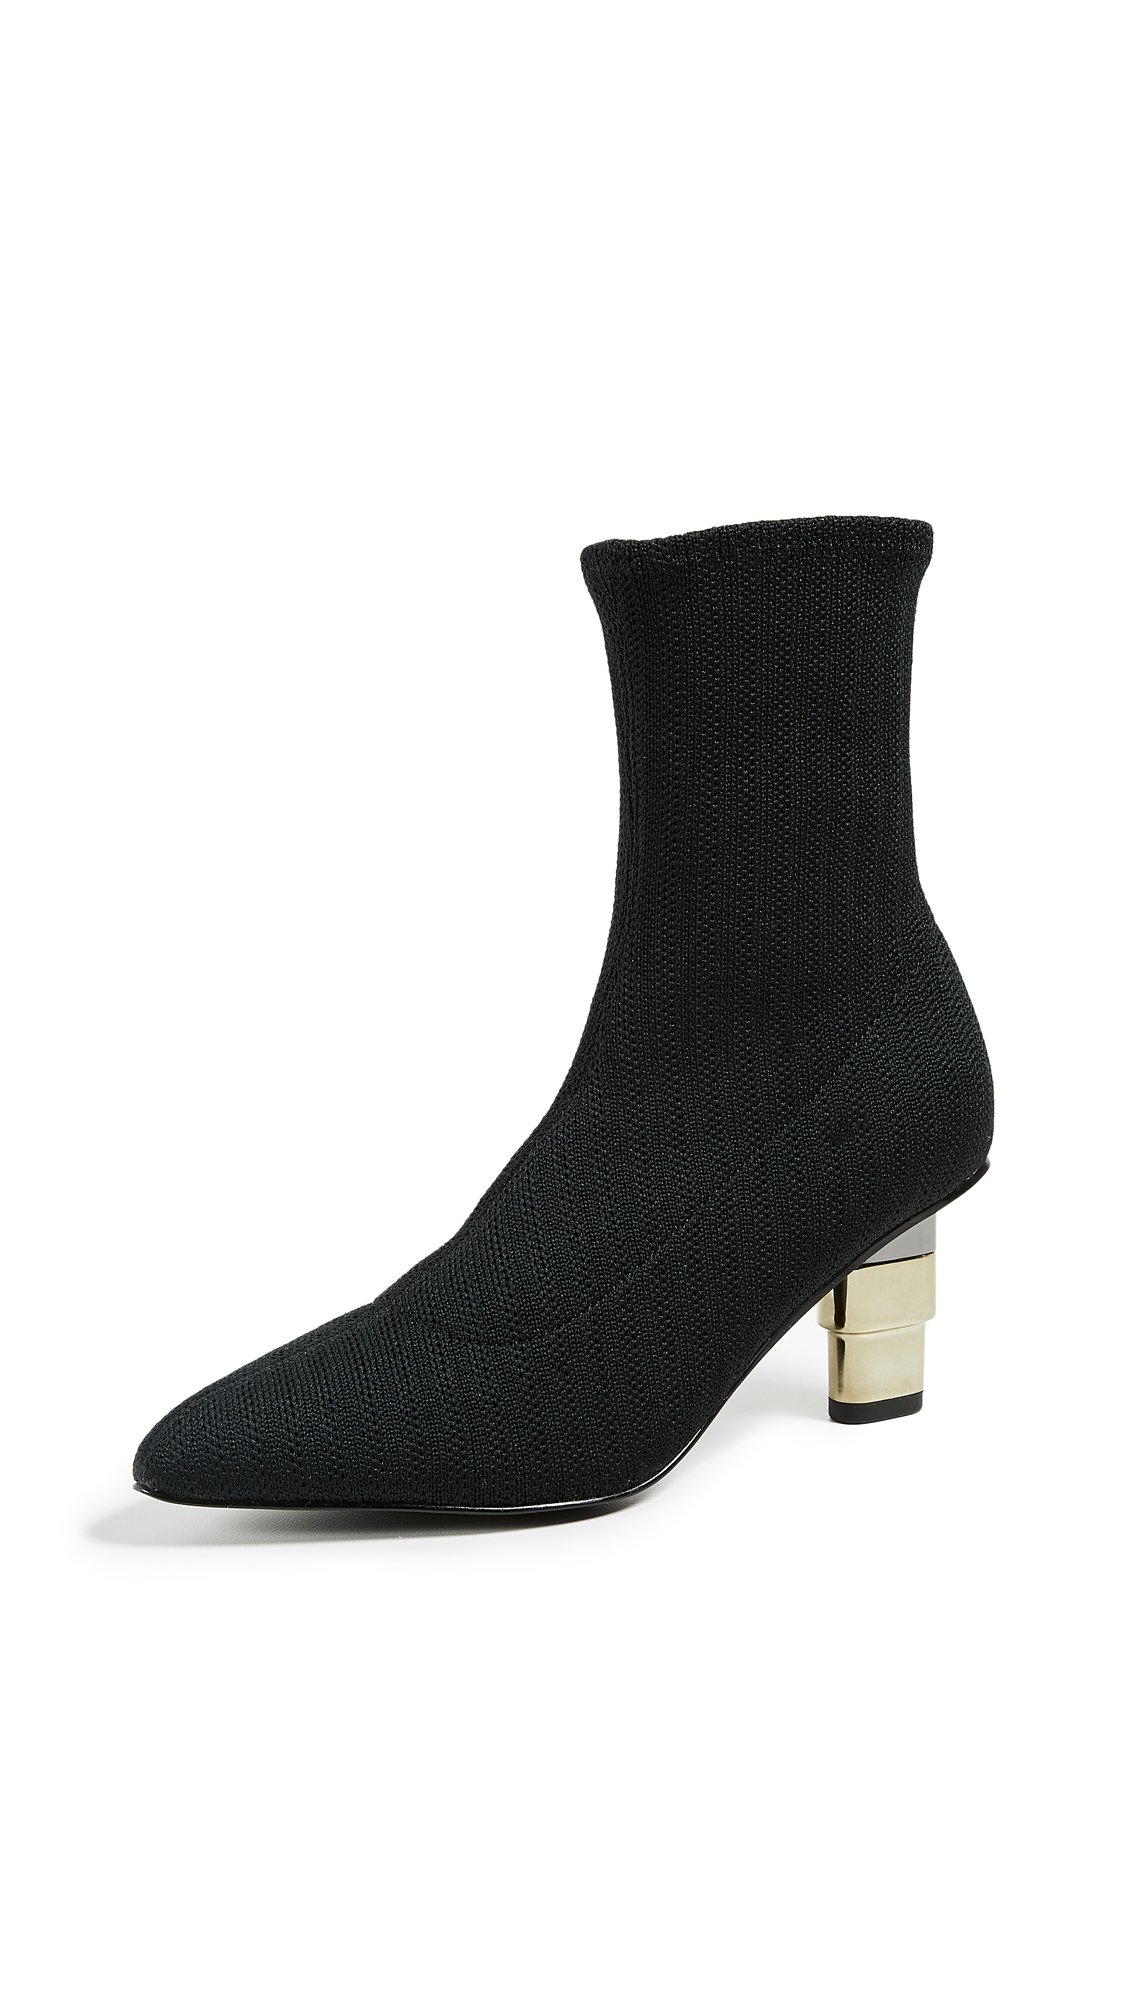 JAGGAR Knit Sock Booties - Black